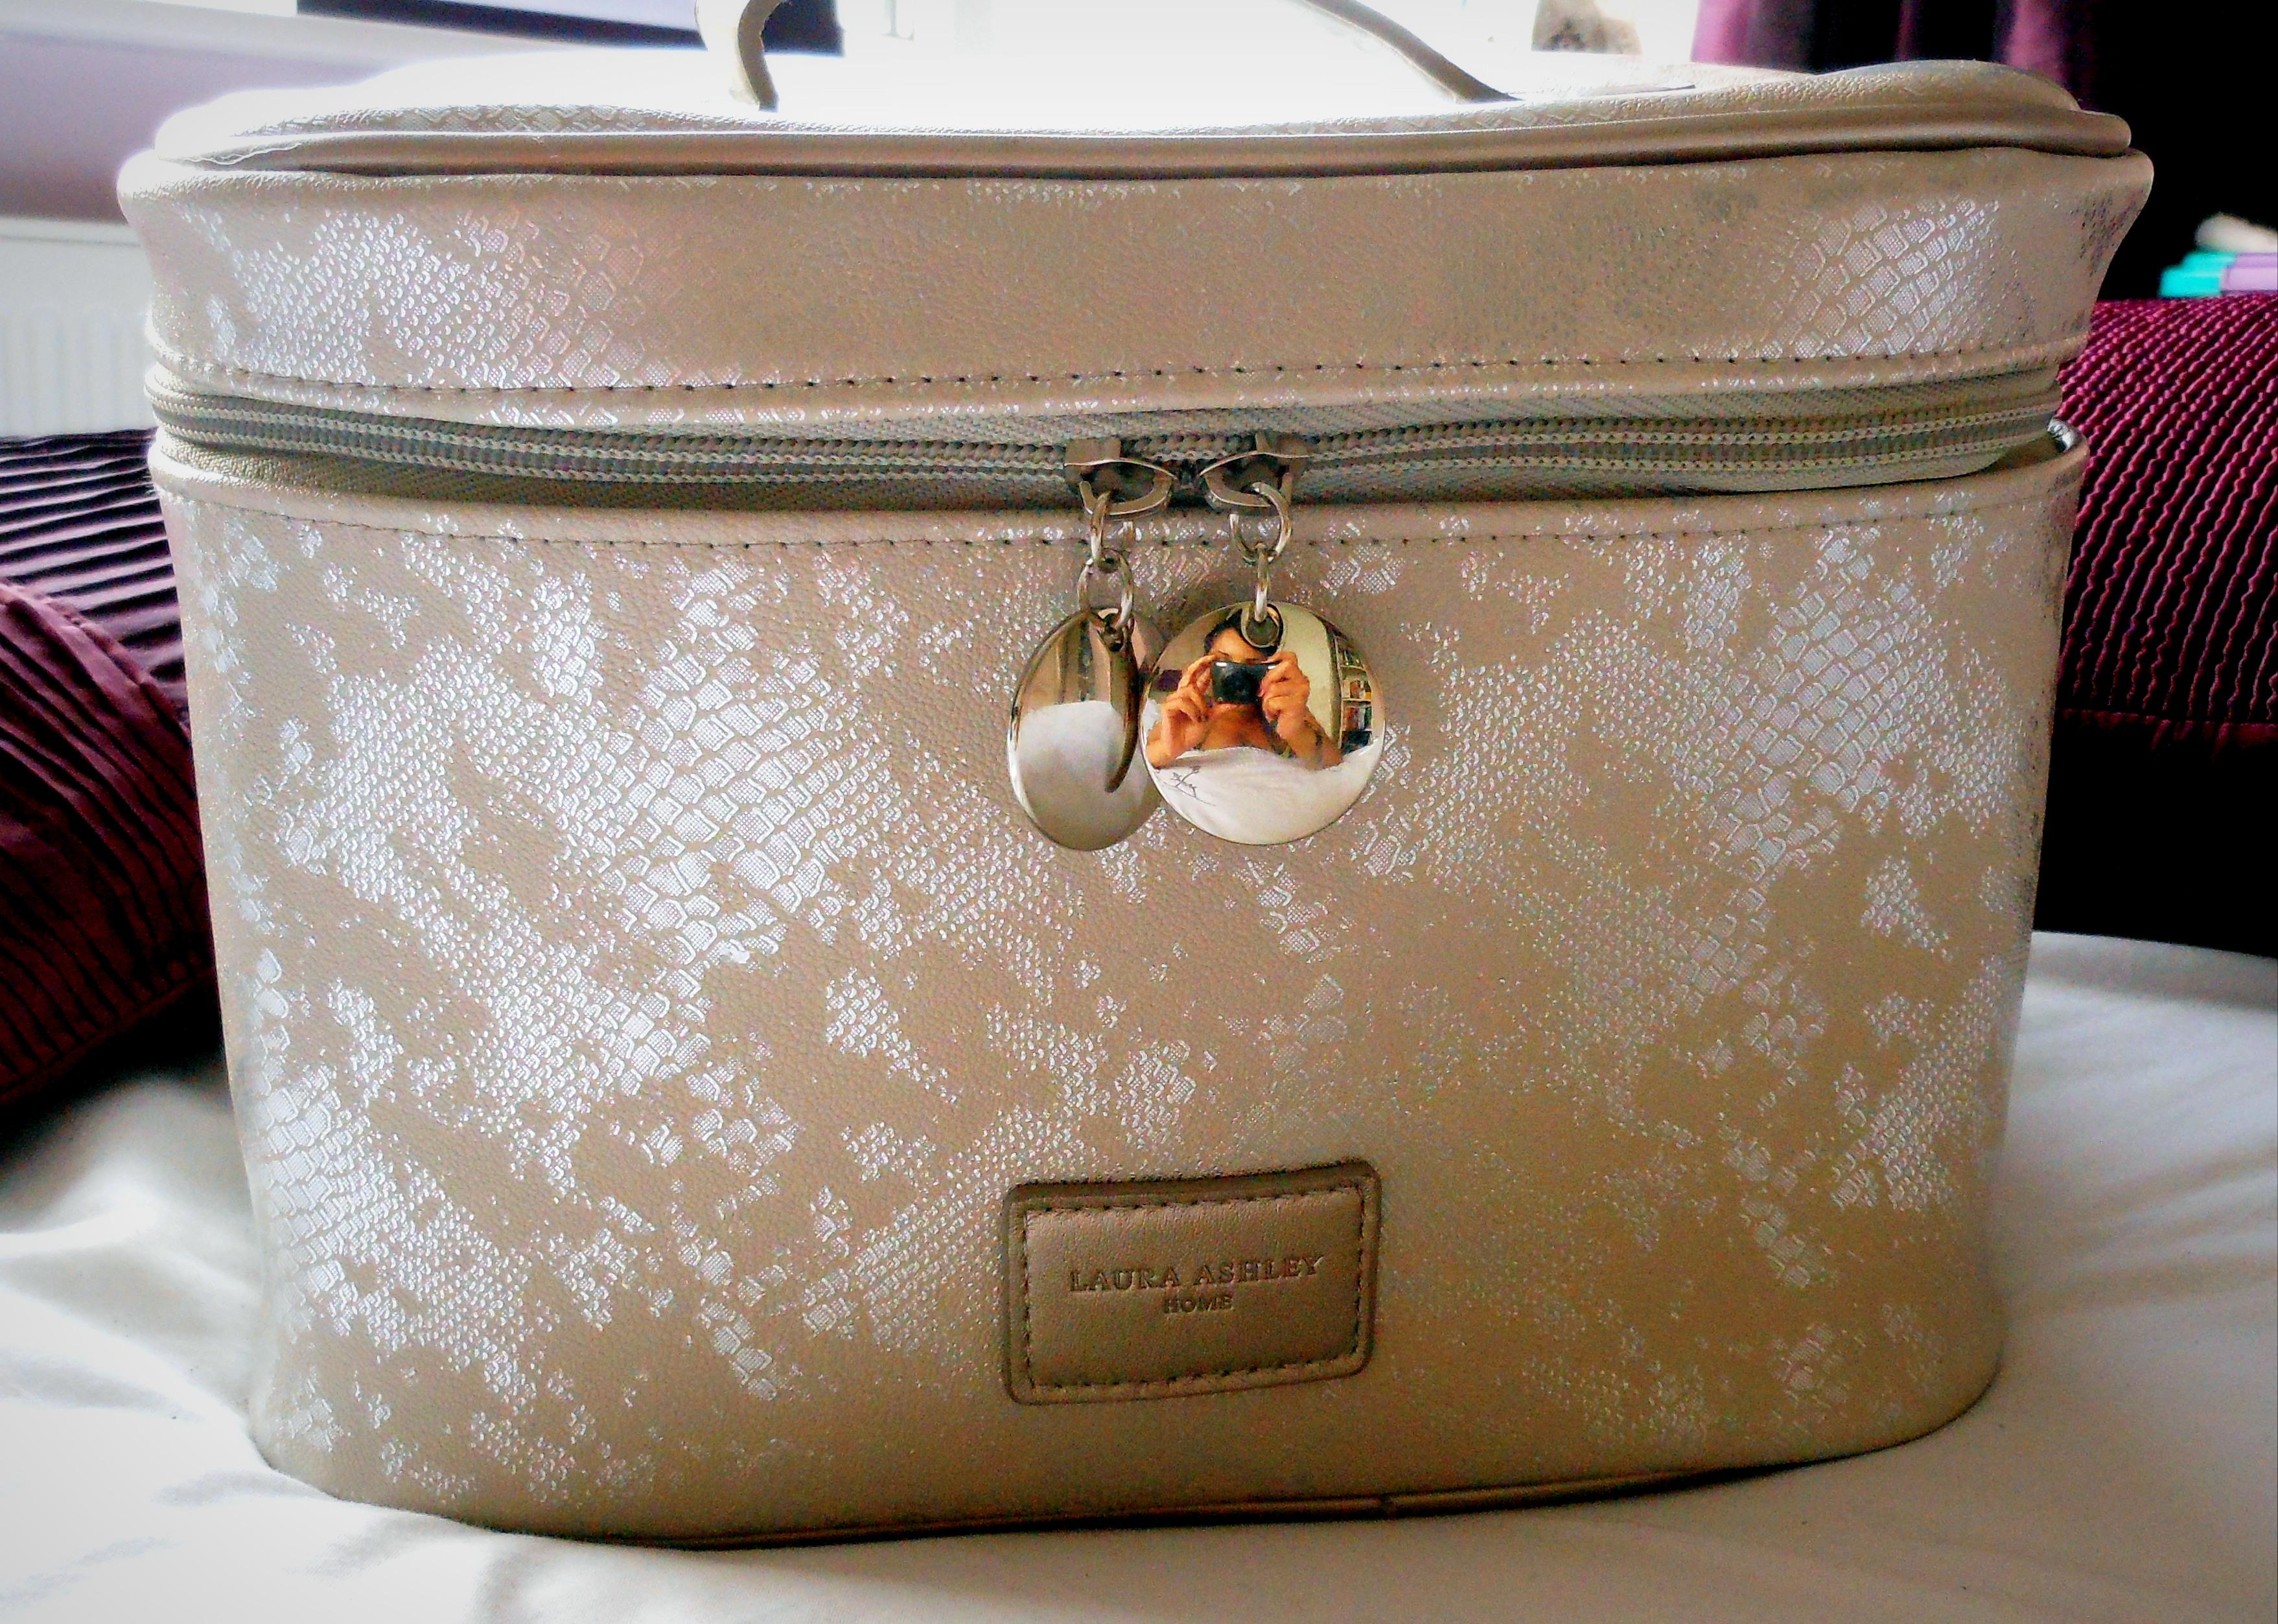 Laura Ashley Travel Bag